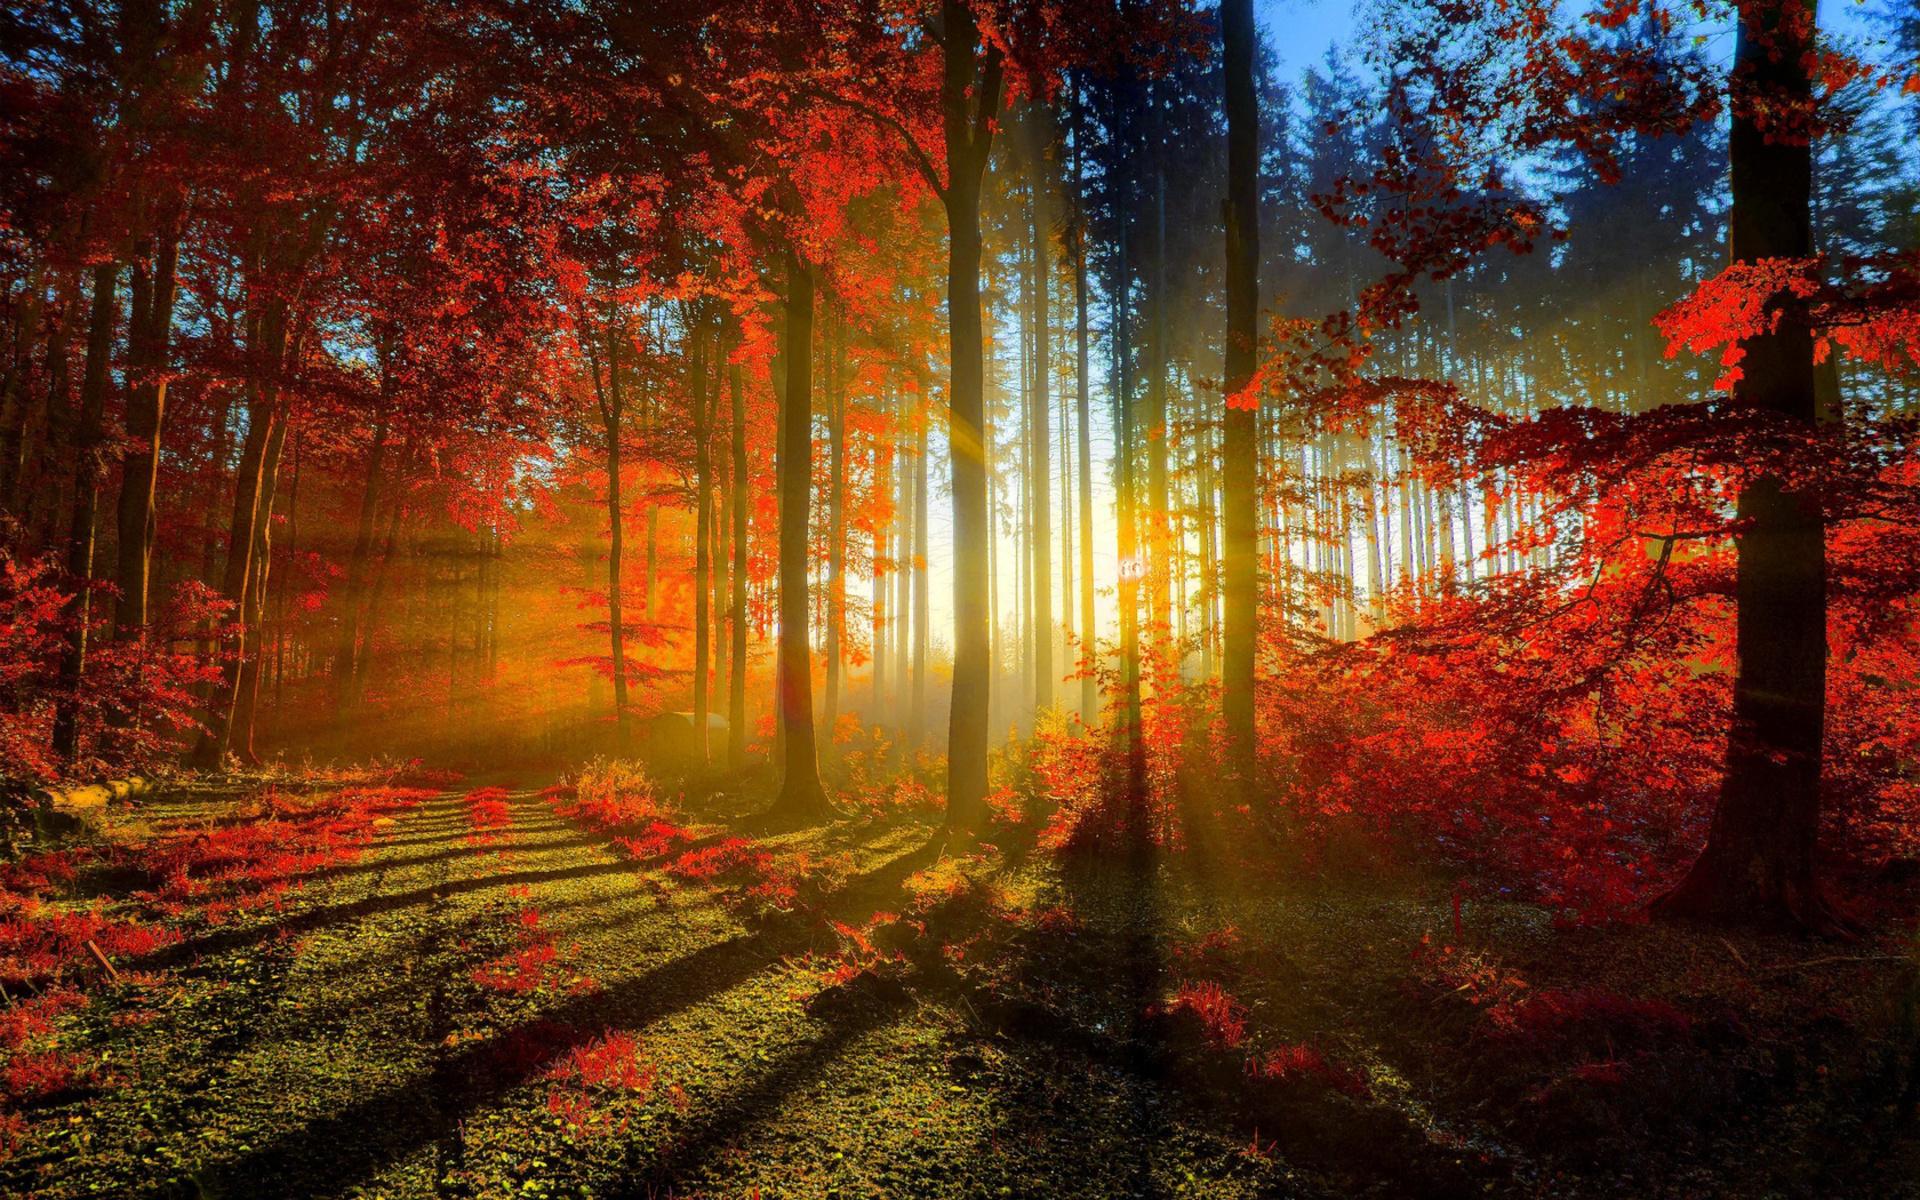 Картинка Утро в осеннем лесу » Осень » Природа » Картинки ...